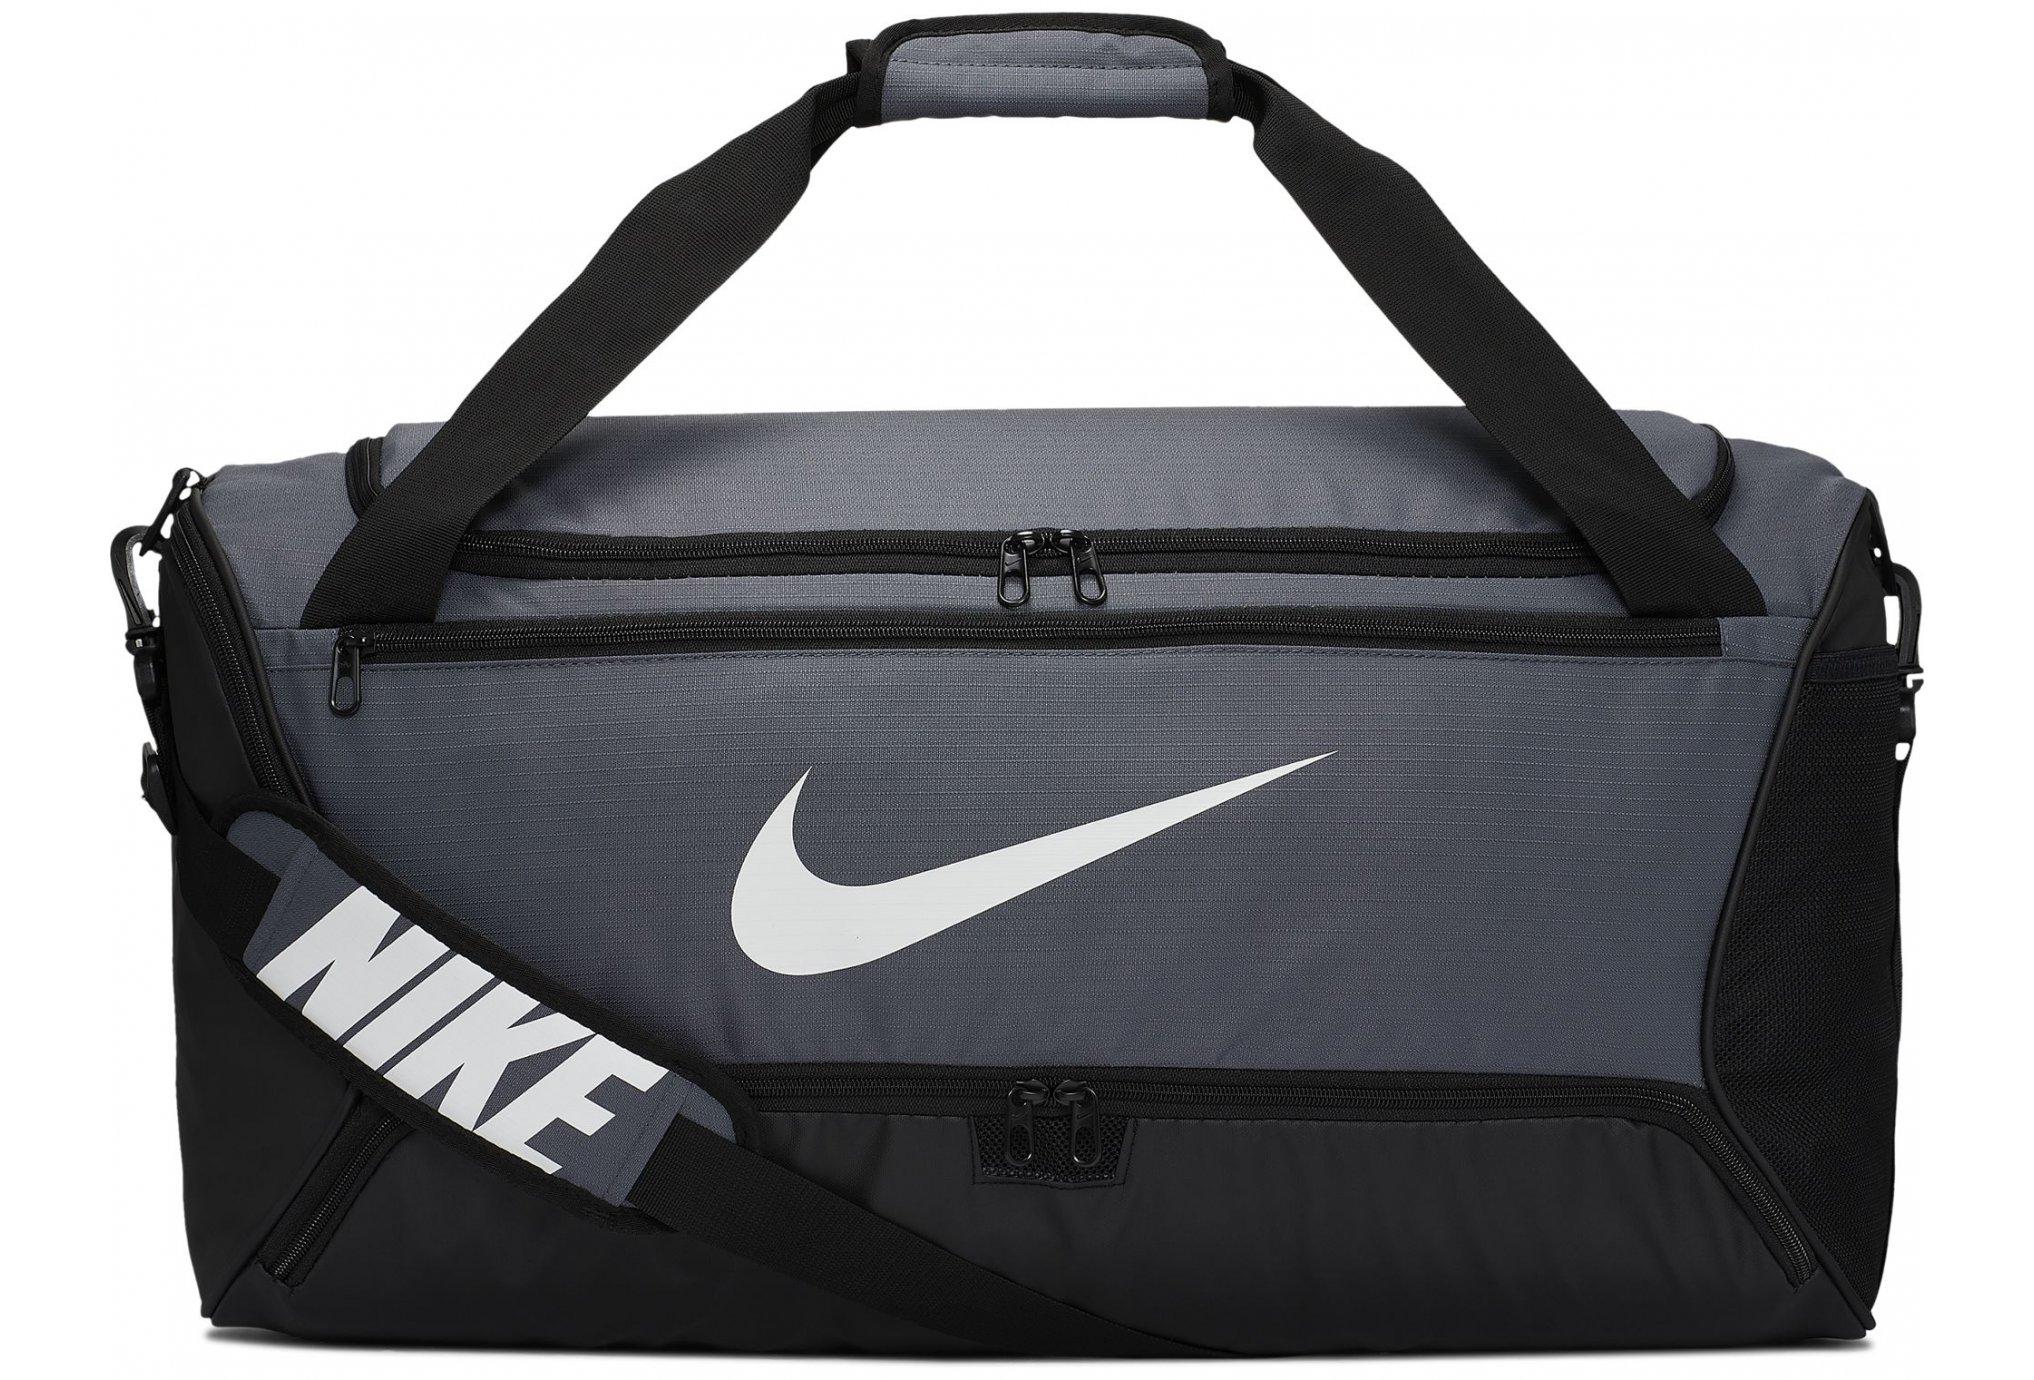 Nike Brasilia duffel 9.0 - m sac de sport